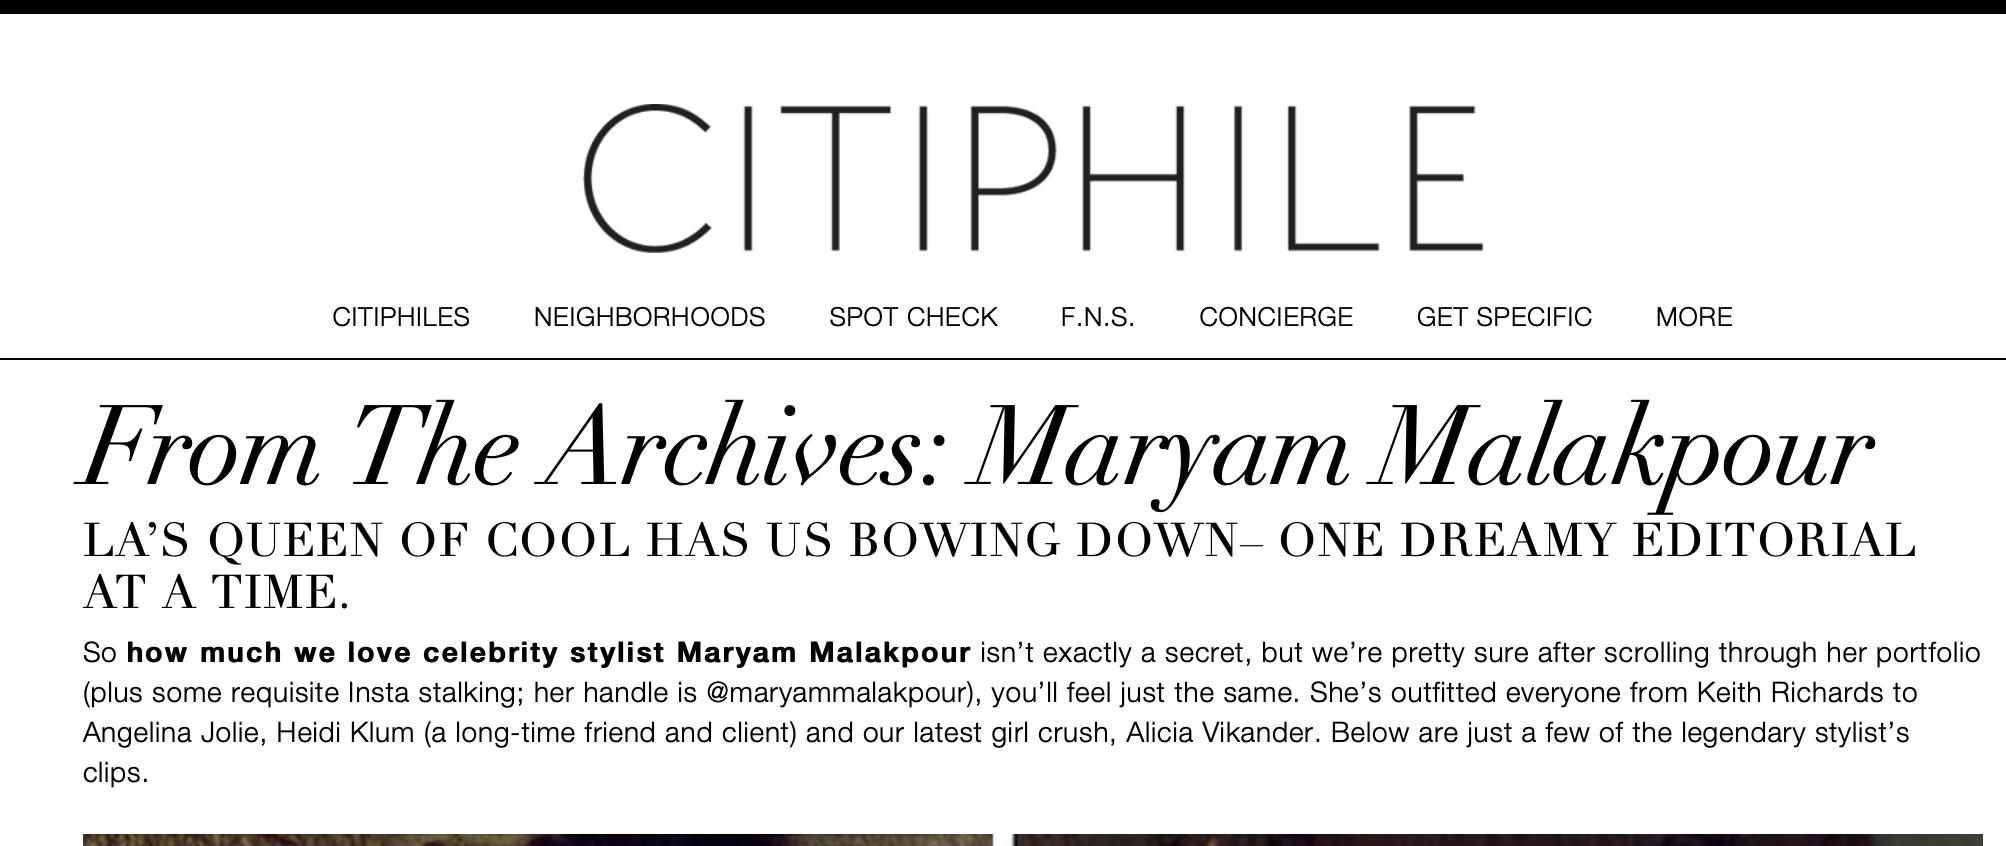 CITIPHILE - read more